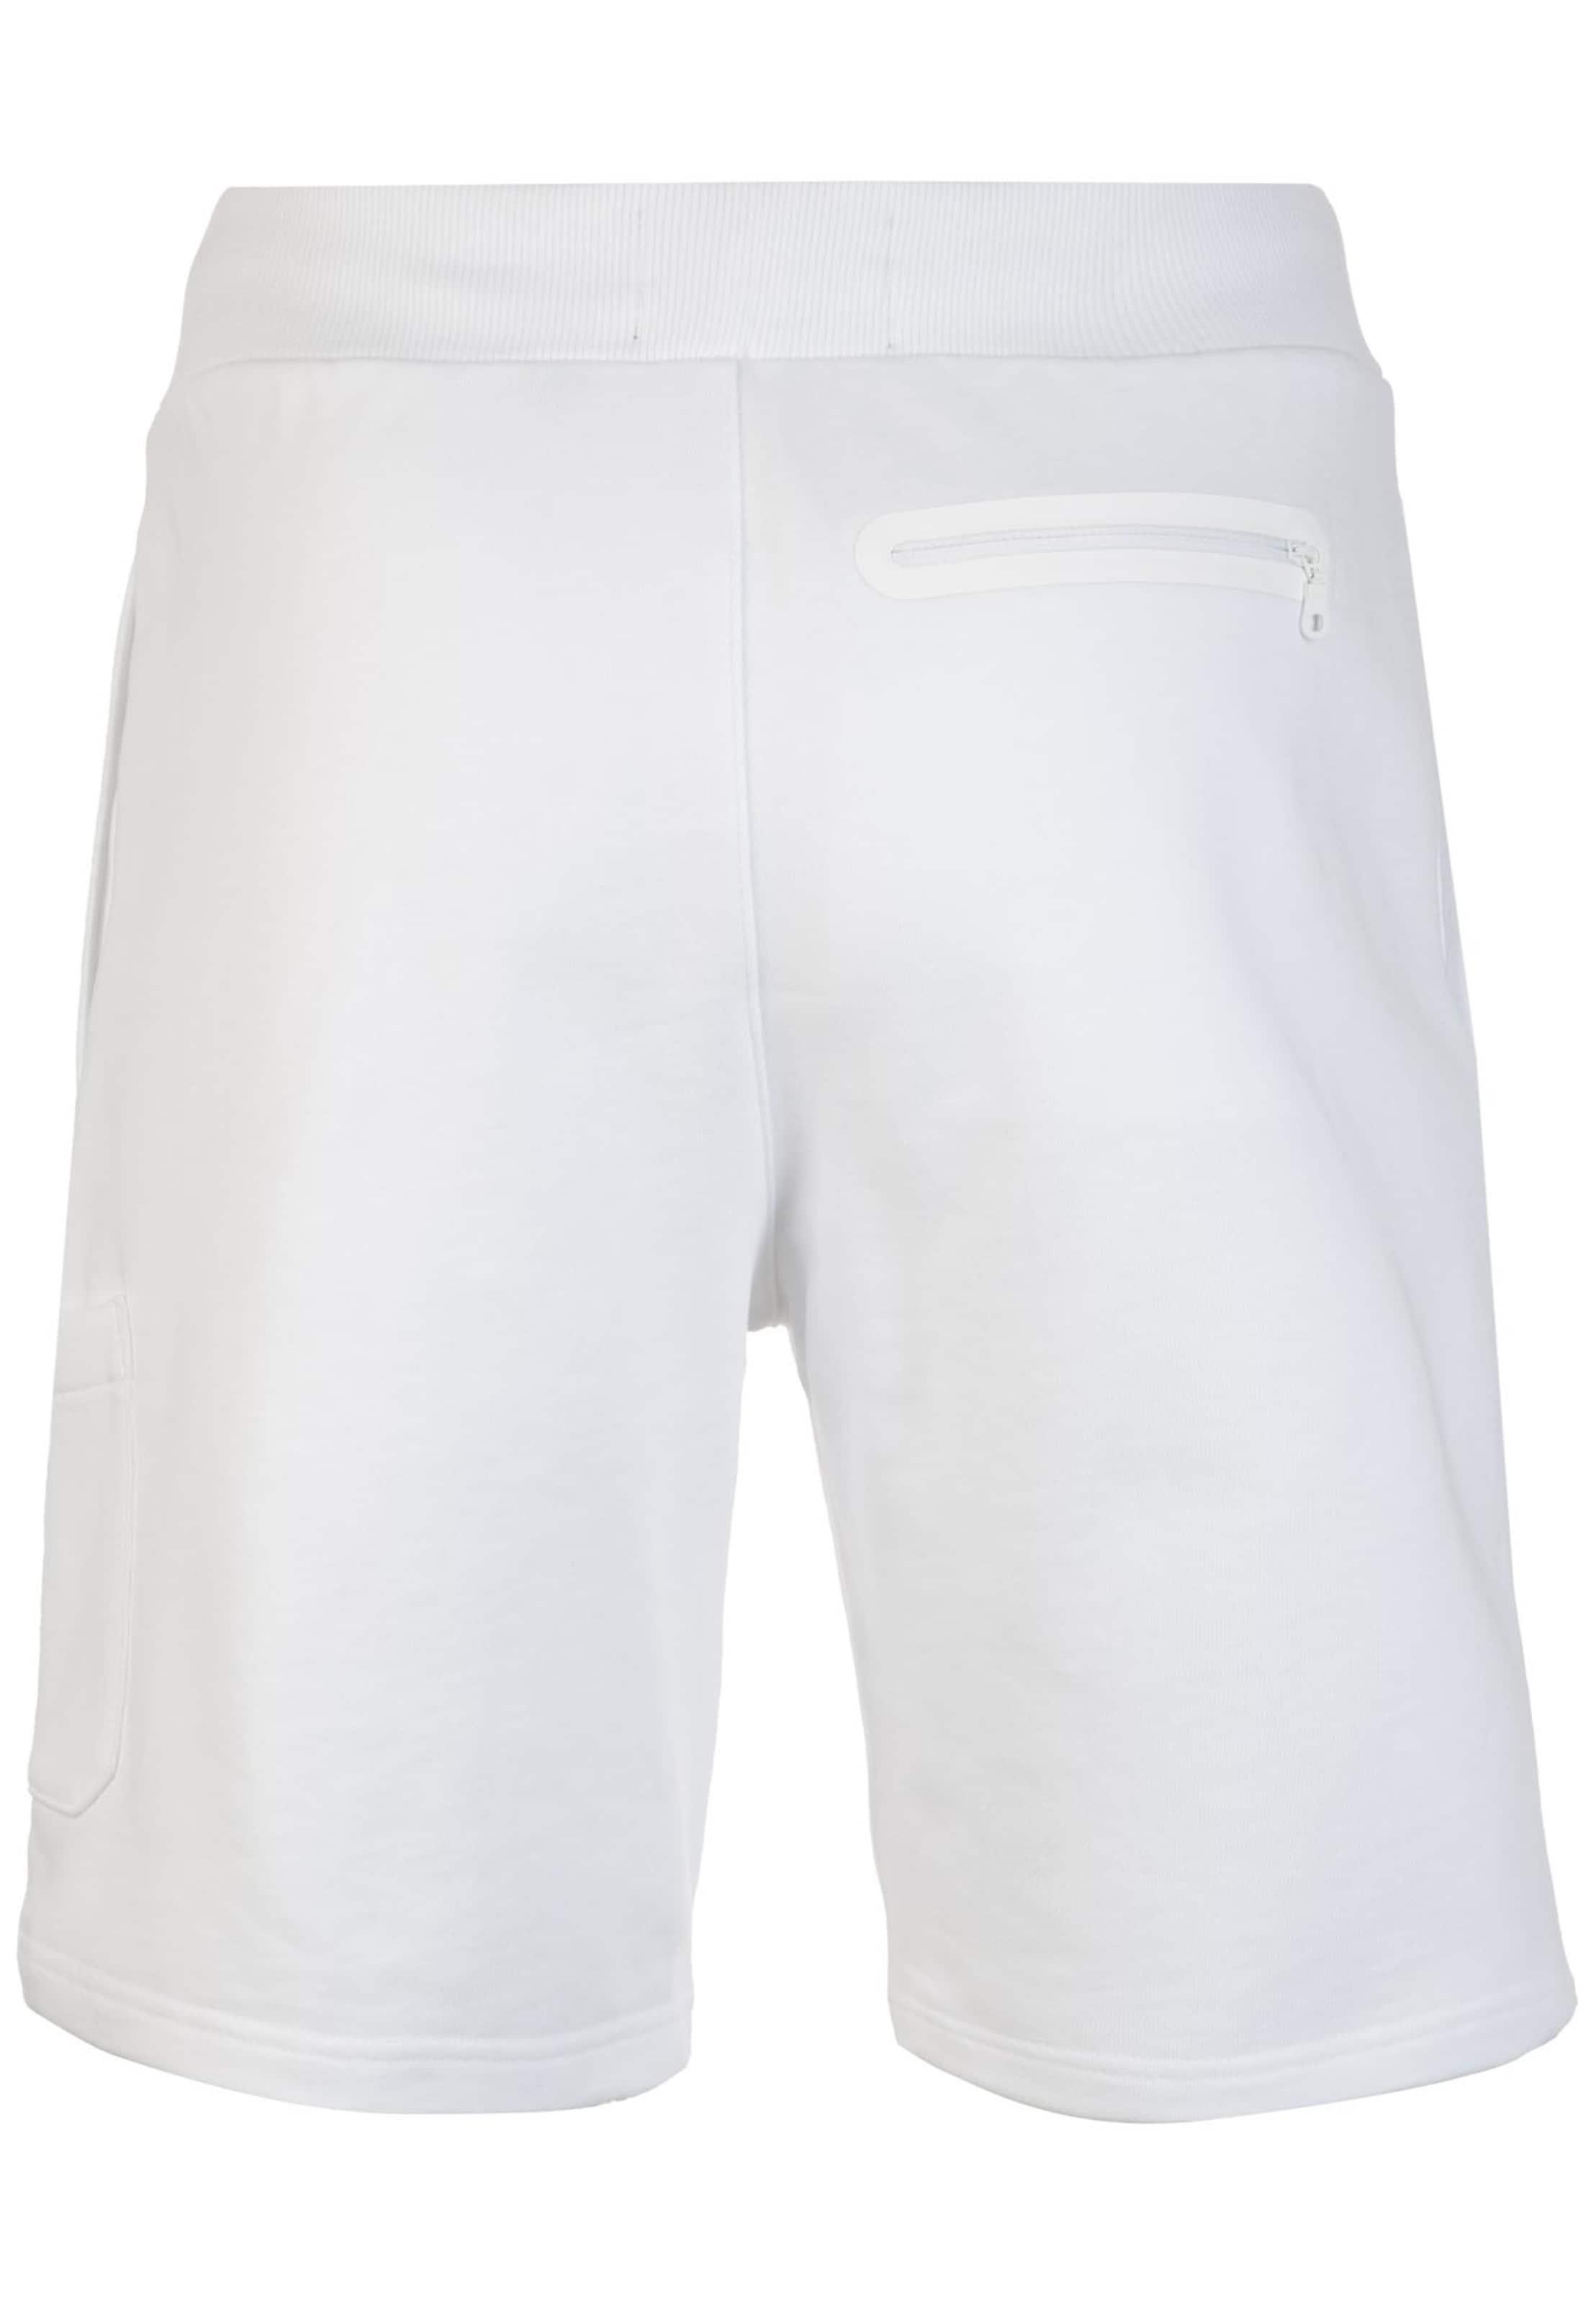 Pantalon JauneBlanc Scott Lyleamp; JauneBlanc Pantalon Scott En Lyleamp; En Lyleamp; ChrtQxsd